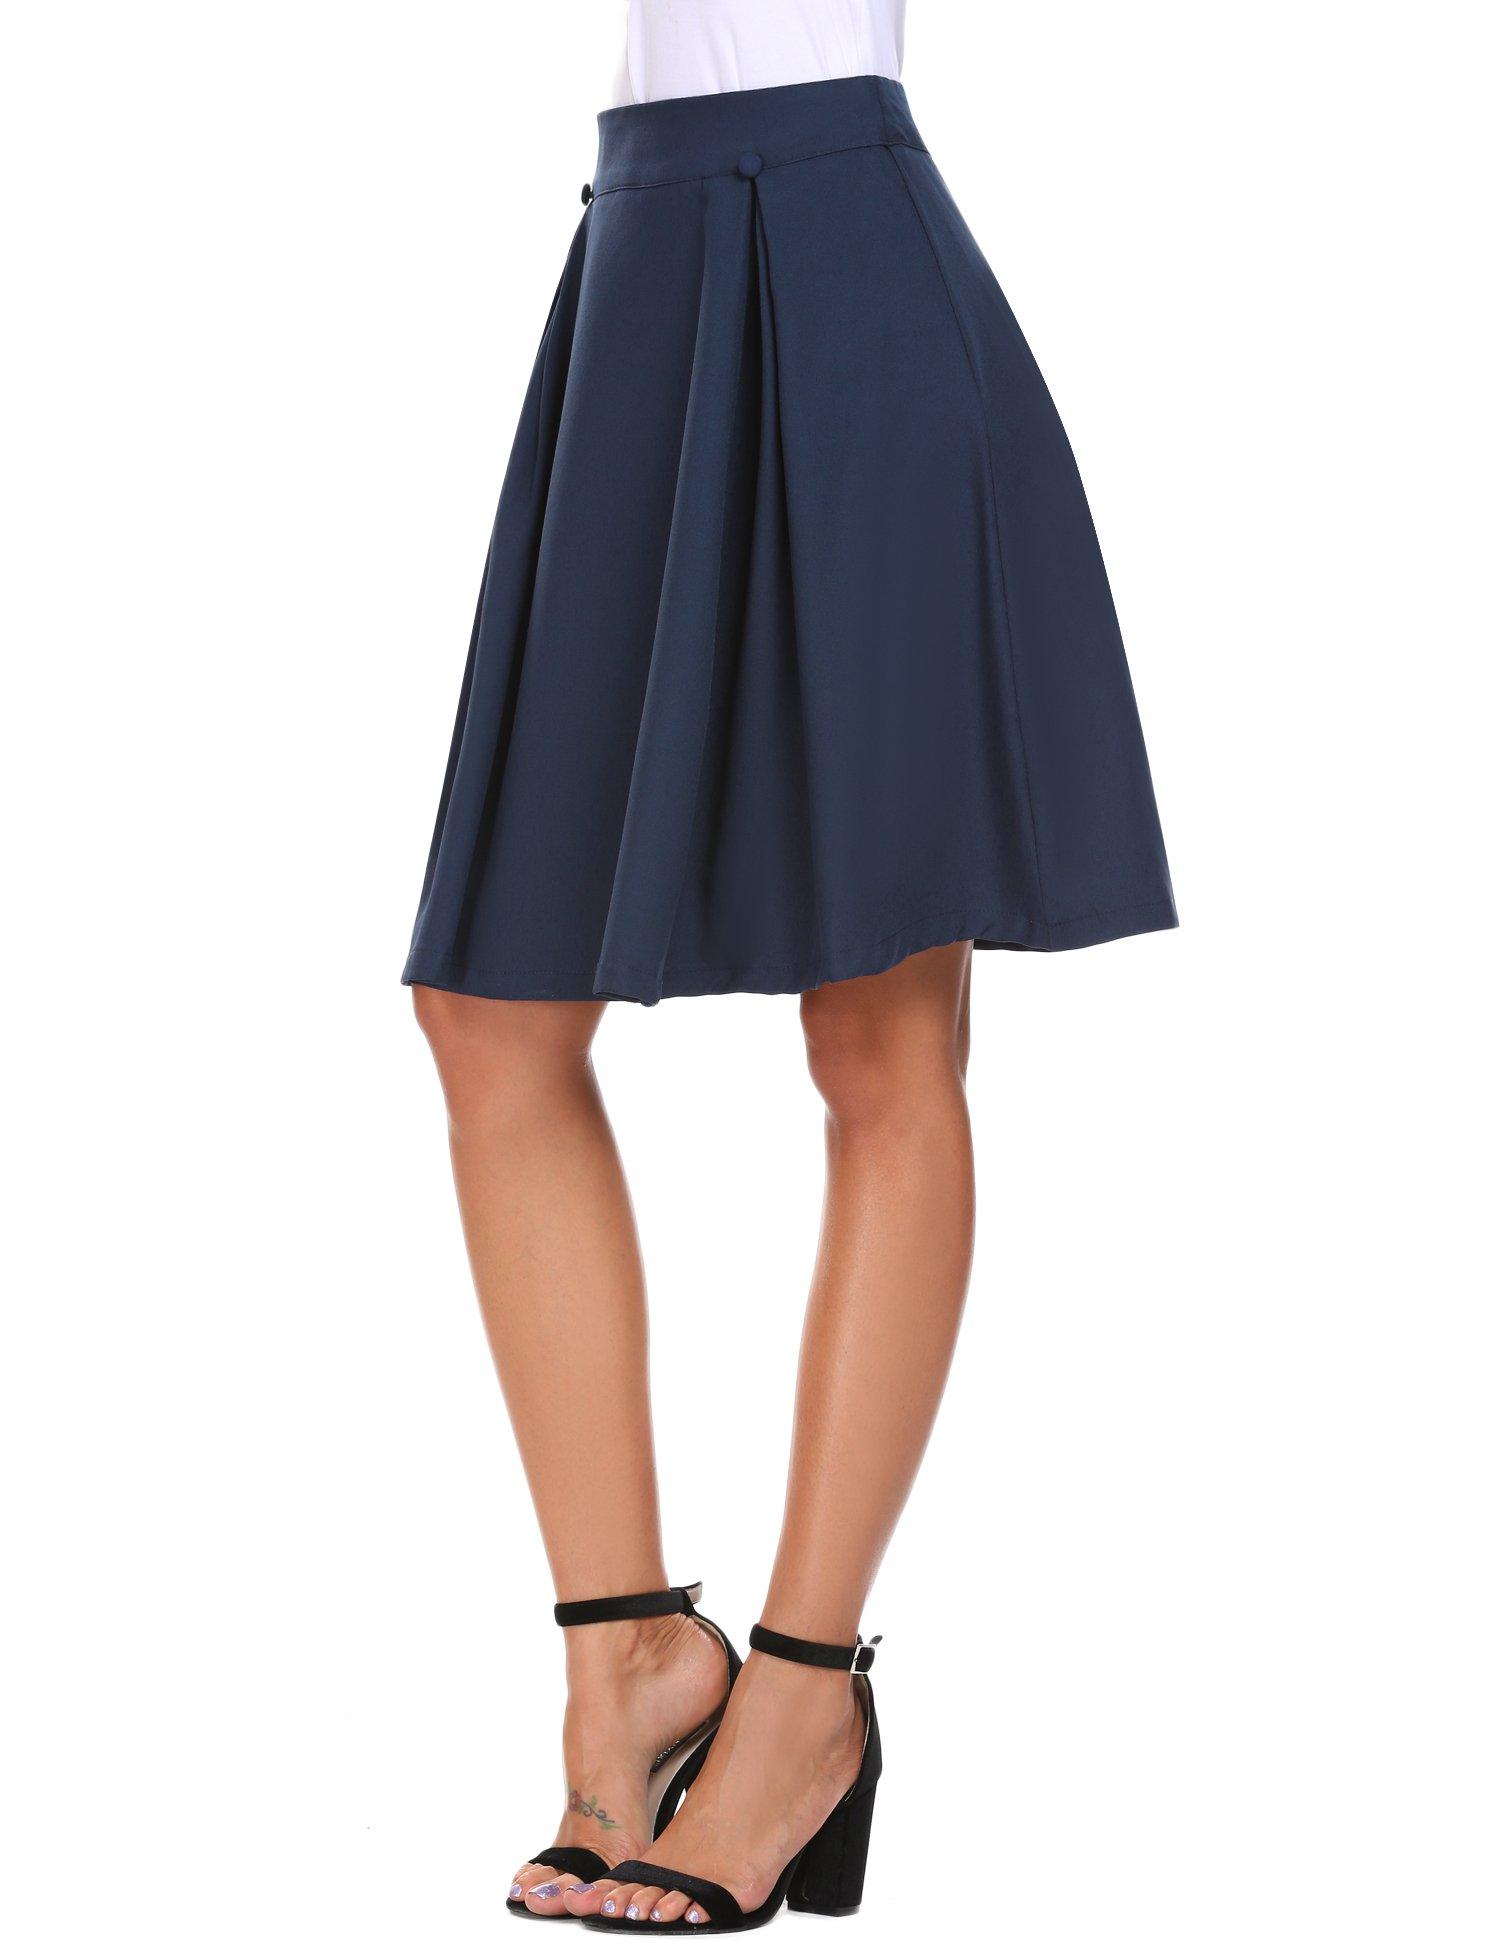 Zeagoo Women's High Waist Pleated Midi Skirt Dark Blue XL for Teens